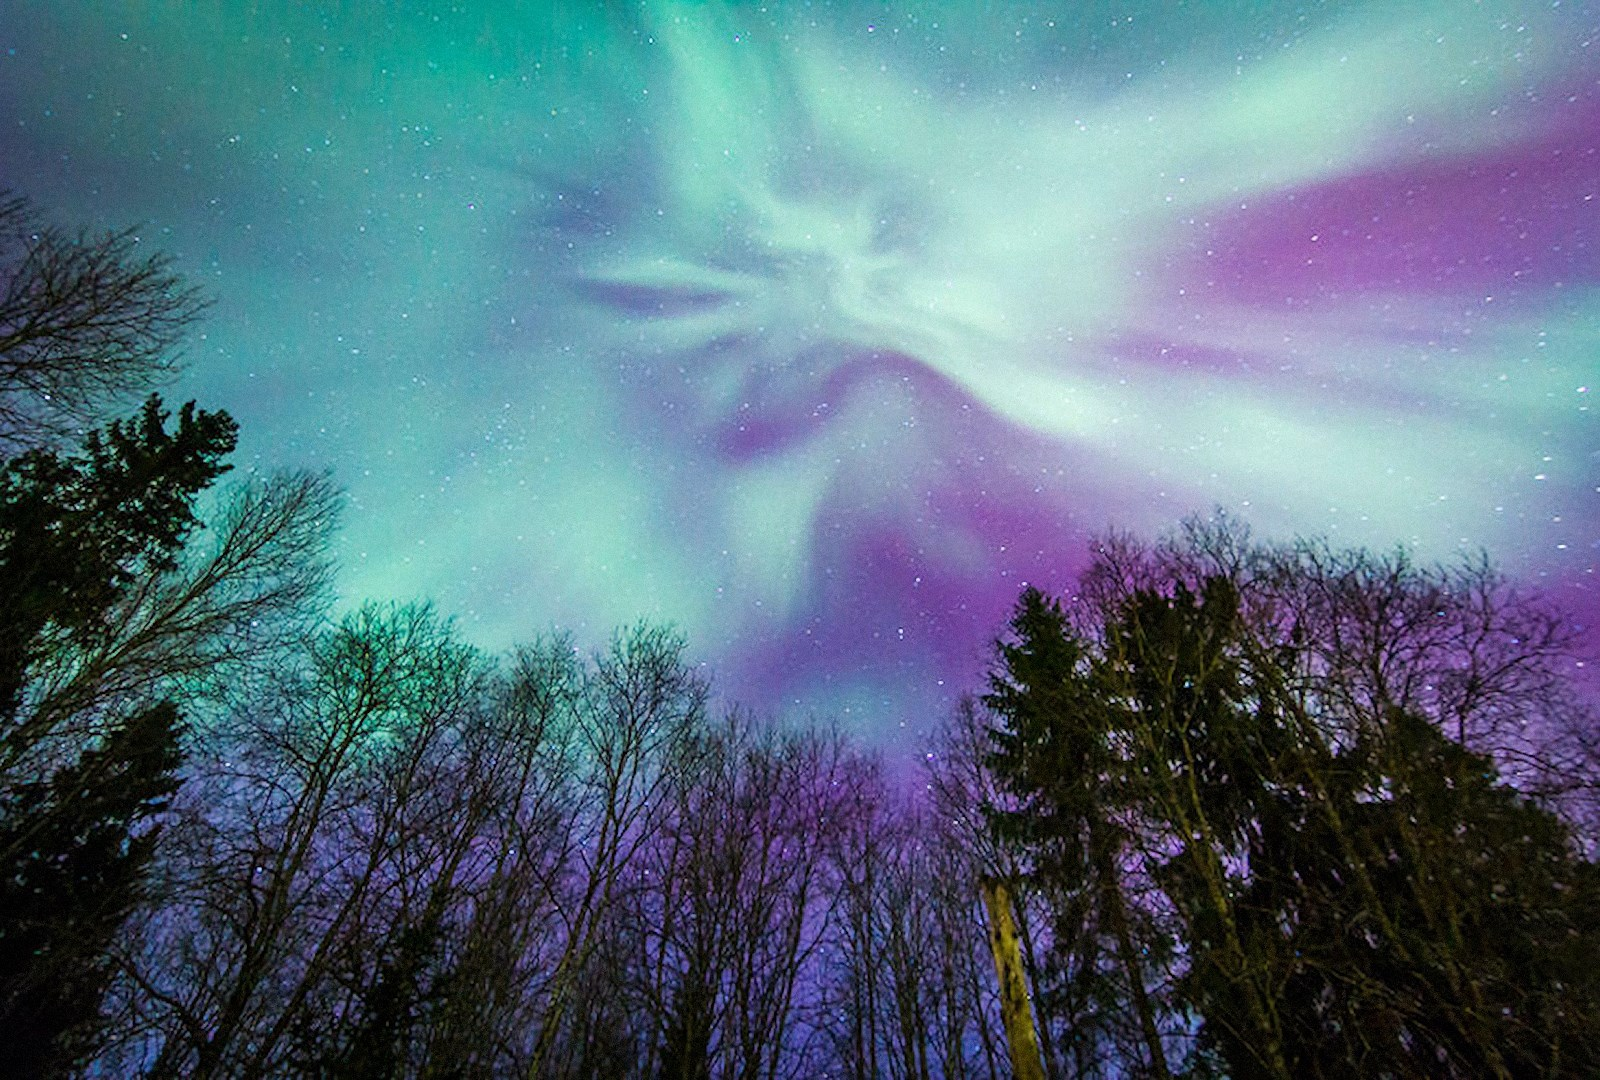 00 Viktor Olkhovsky. Aurora Borealis in Leningrad Oblast 1. 2015